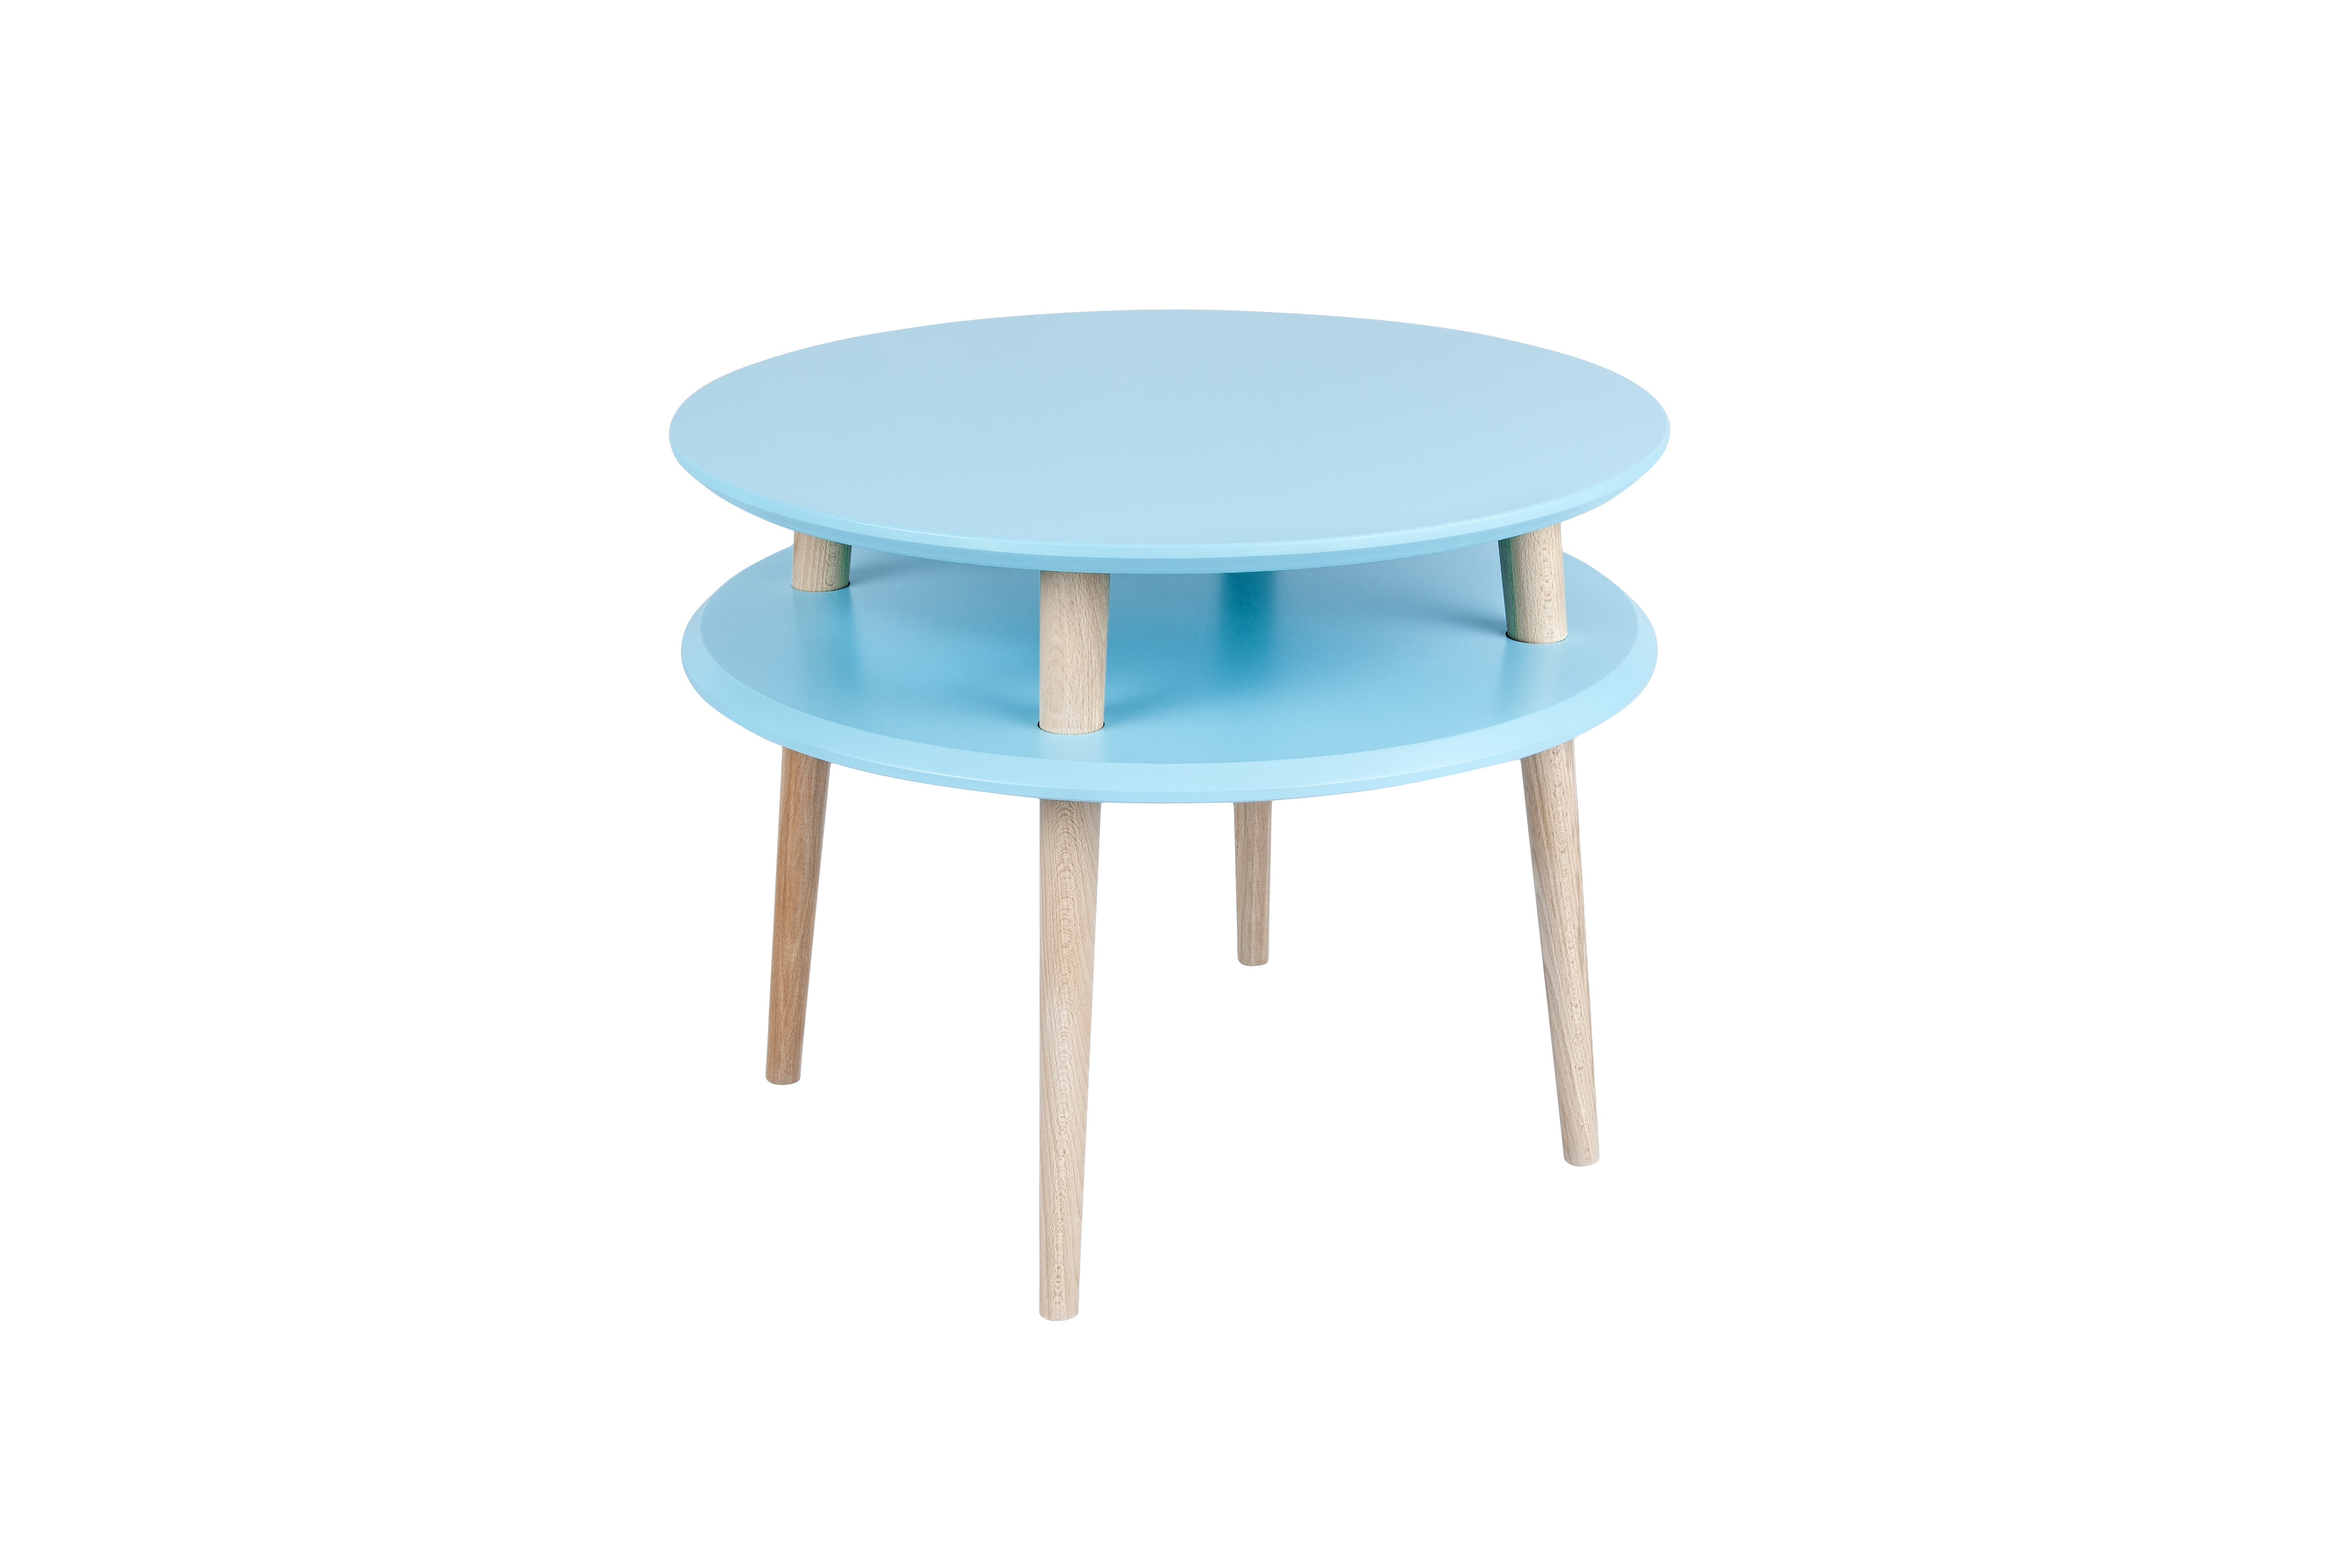 Masa de cafea Ufo Medium Dark Turquoise, Ø57xh45 cm